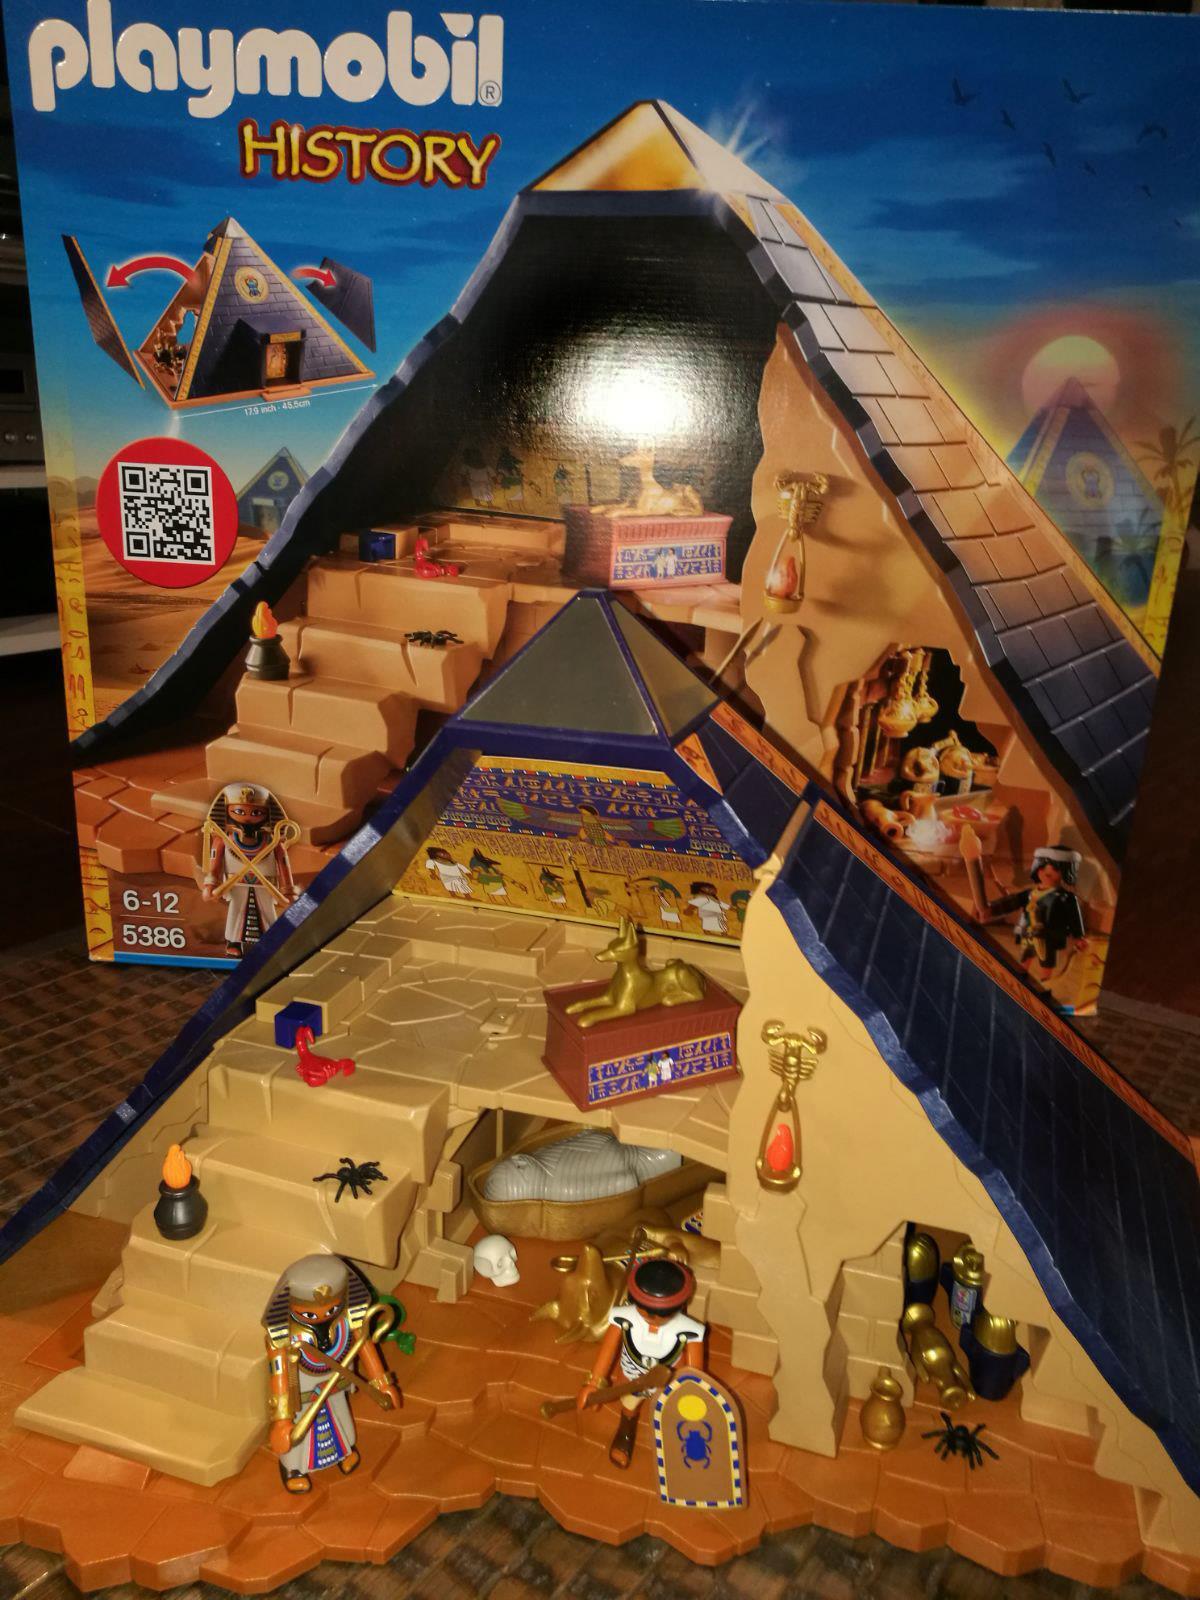 L egypte antique reprend vie avec la pyramide playmobil - Egypte playmobil ...